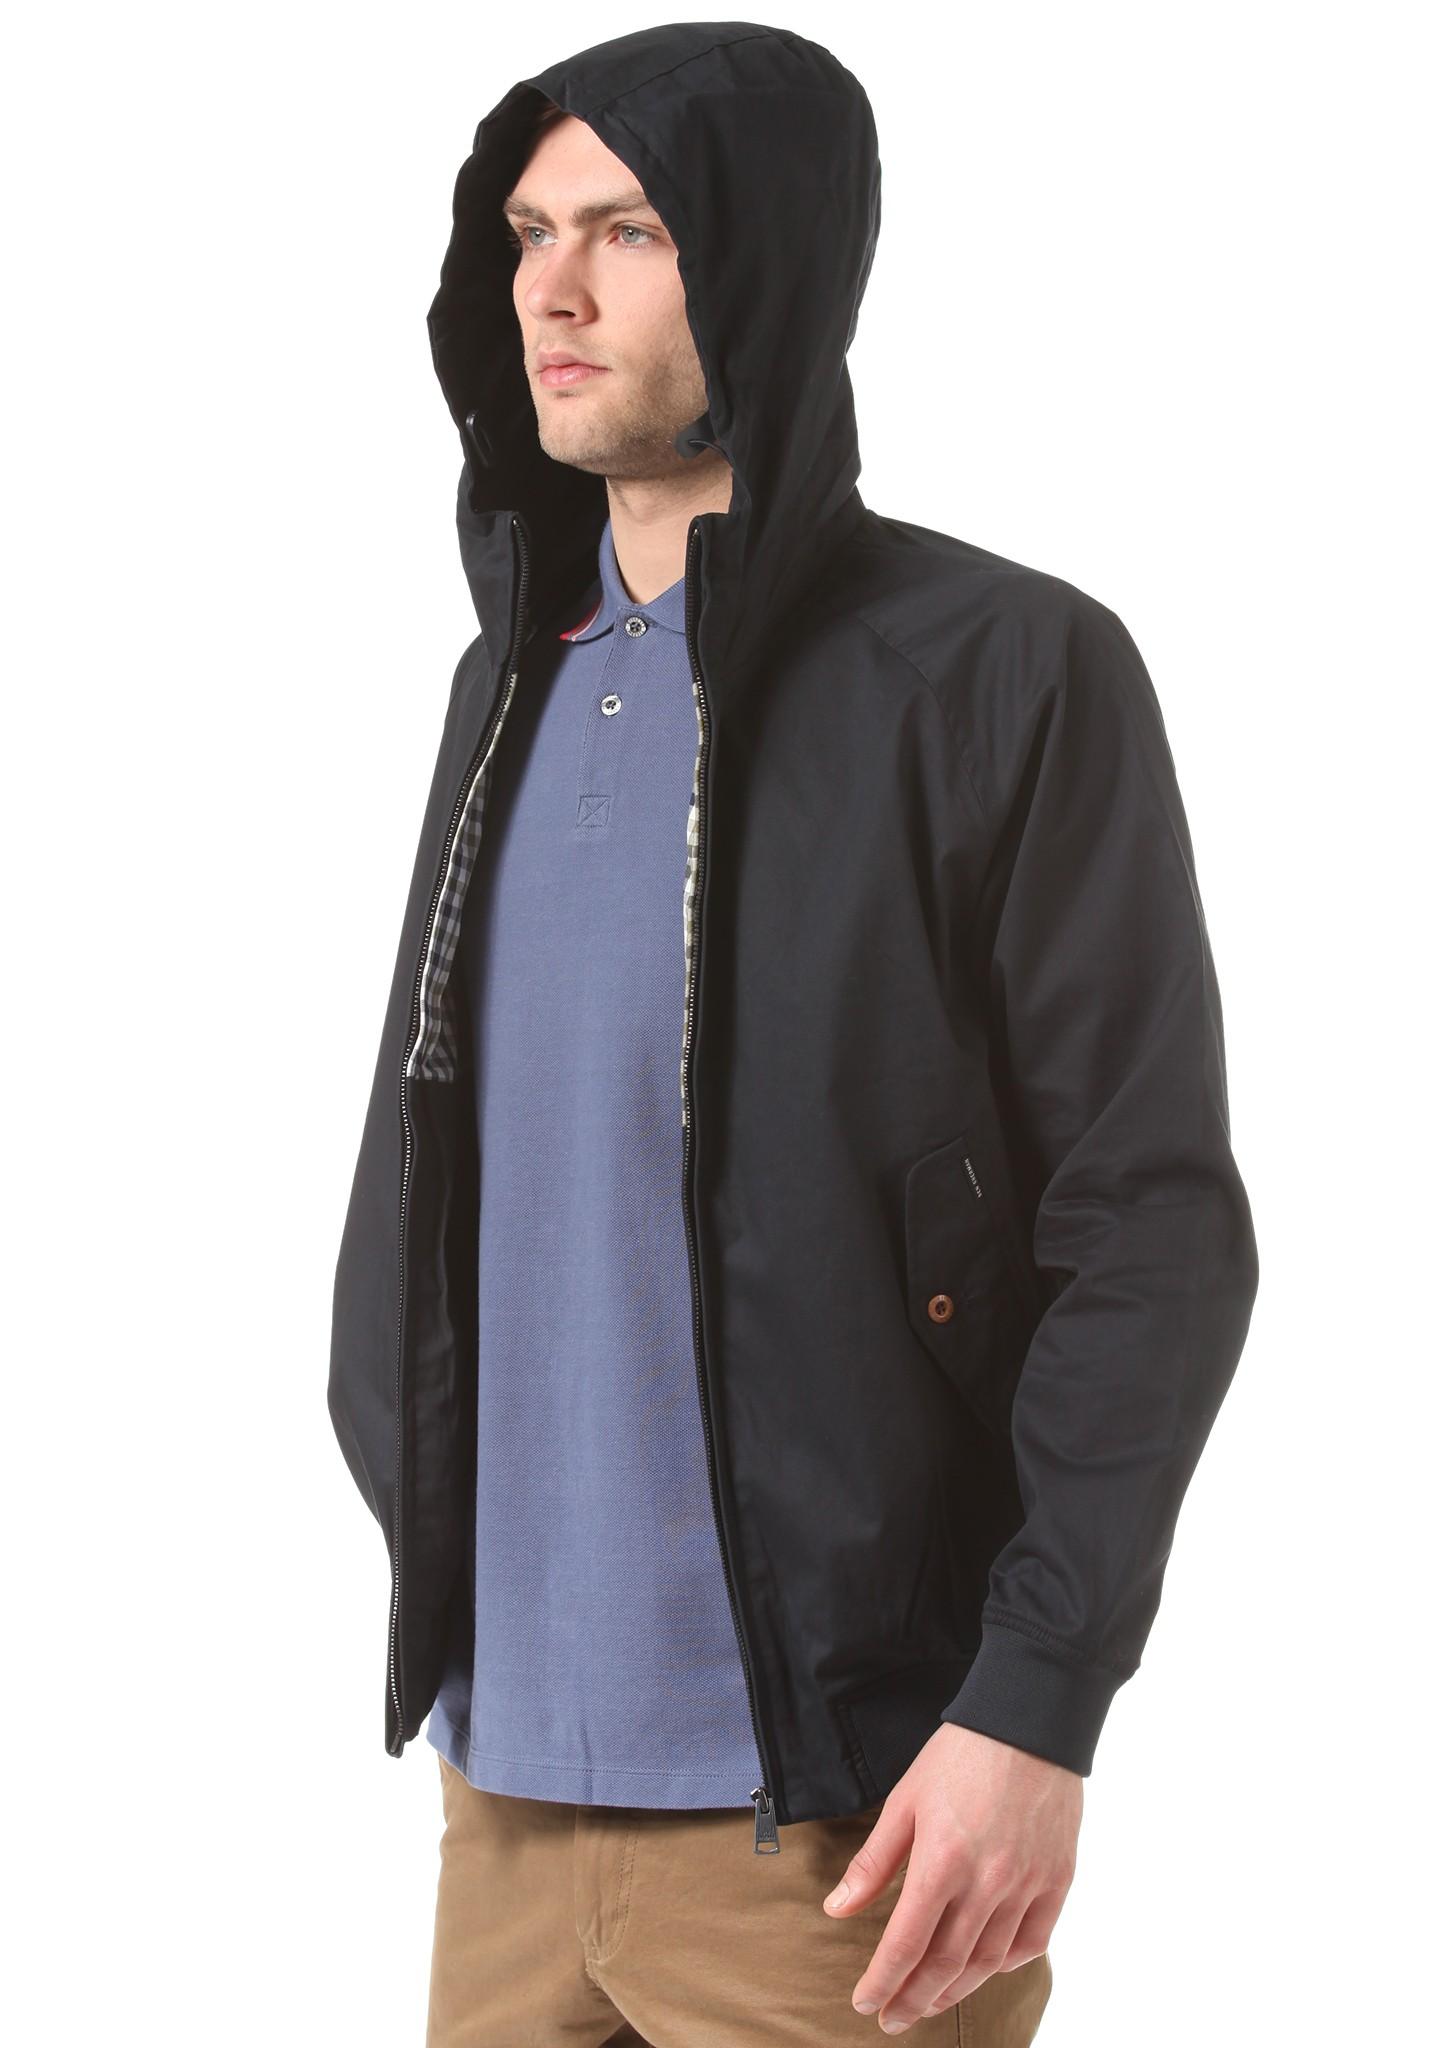 neu ben sherman harrington hooded jacket herren jacke ebay. Black Bedroom Furniture Sets. Home Design Ideas